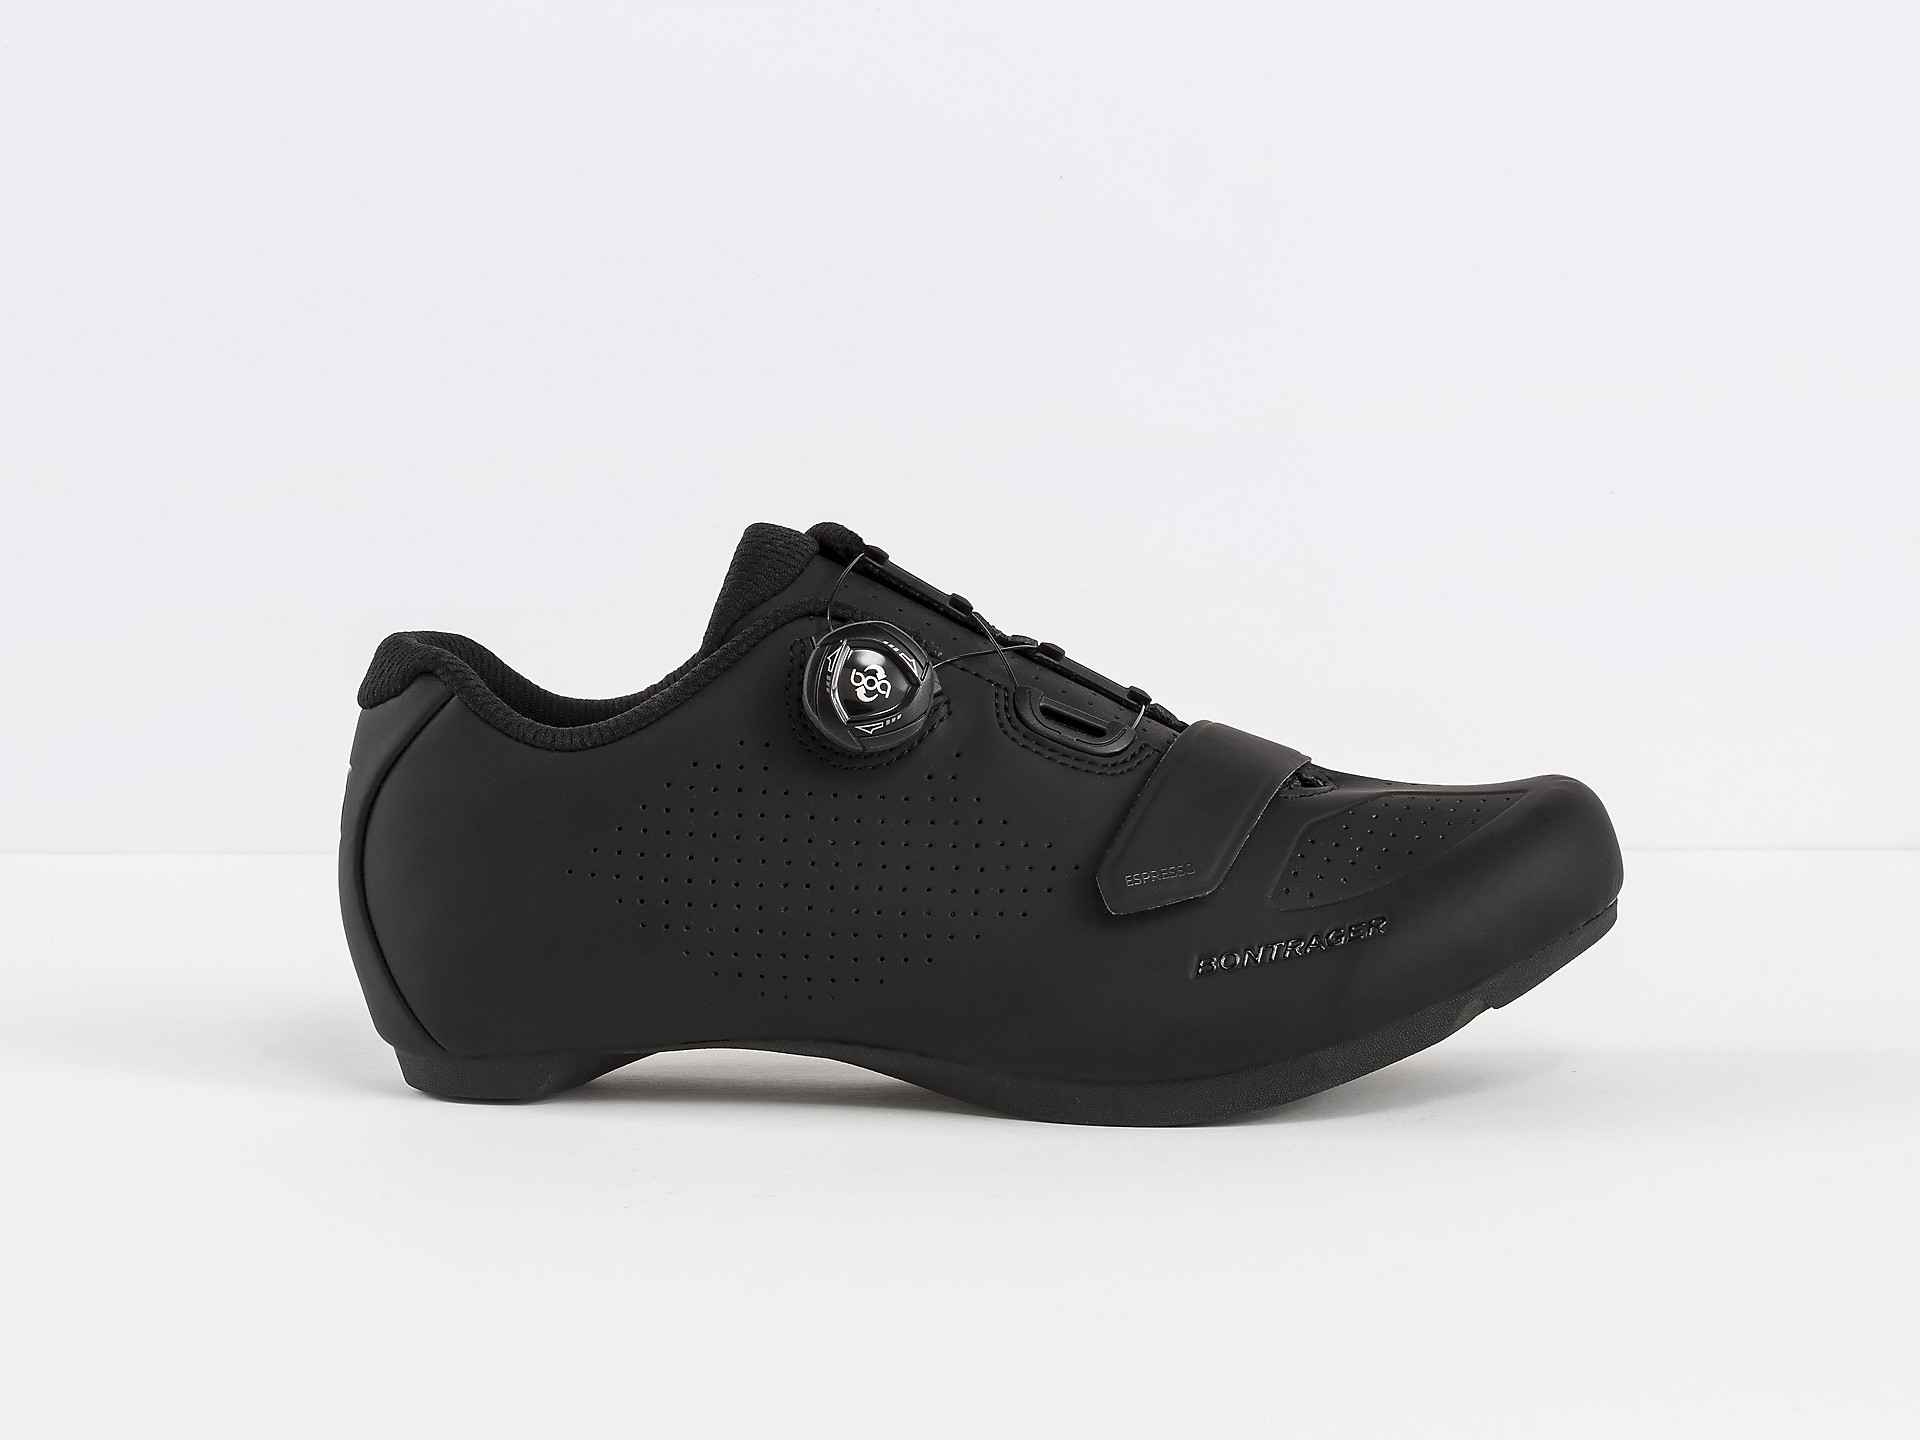 8a43aae2209 Bontrager Espresso Road Shoe